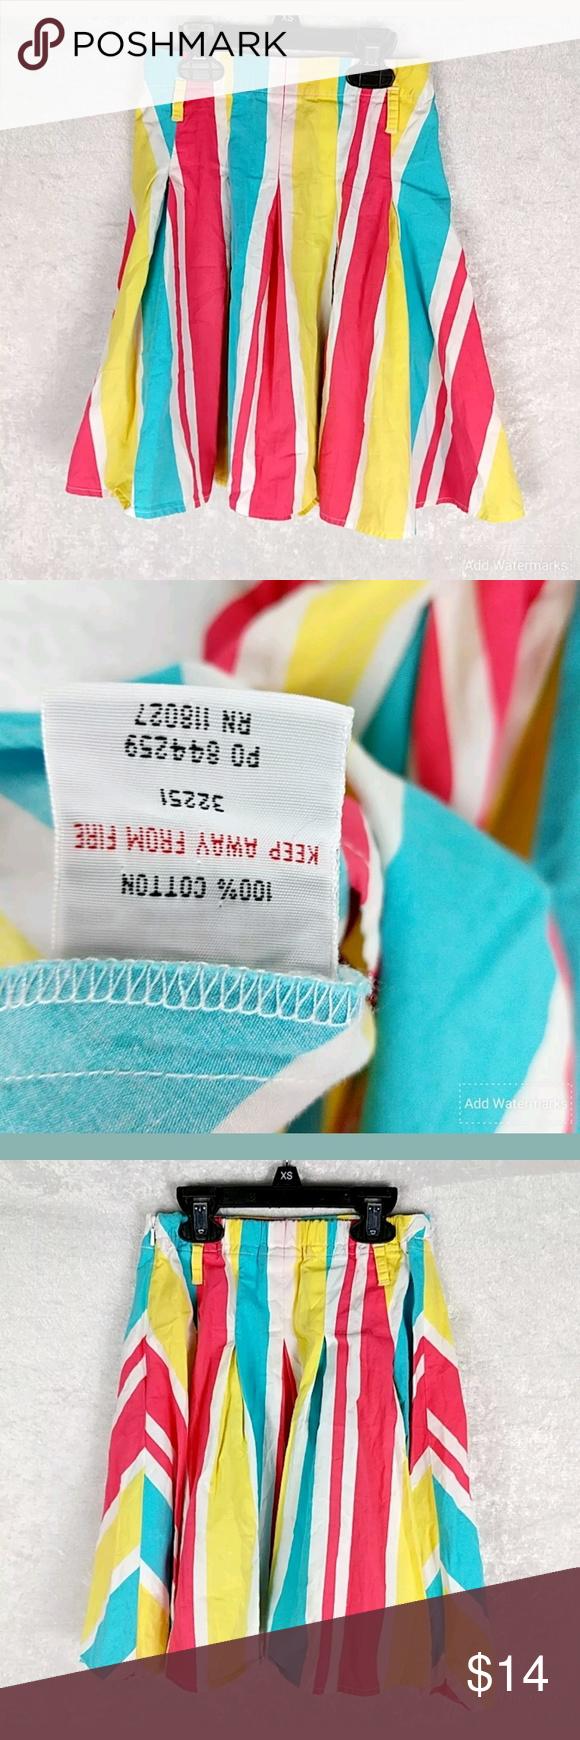 Mini Boden Skirt sz 7/8 colorful twirl skirt MINI BODEN SKIRT SIZE 7/8 ADJUSTABLE WAIST PINK BLUE YELLOW AND WHITE Dd15 Mini Boden Bottoms Skirts #twirlskirt Mini Boden Skirt sz 7/8 colorful twirl skirt MINI BODEN SKIRT SIZE 7/8 ADJUSTABLE WAIST PINK BLUE YELLOW AND WHITE Dd15 Mini Boden Bottoms Skirts #twirlskirt Mini Boden Skirt sz 7/8 colorful twirl skirt MINI BODEN SKIRT SIZE 7/8 ADJUSTABLE WAIST PINK BLUE YELLOW AND WHITE Dd15 Mini Boden Bottoms Skirts #twirlskirt Mini Boden Skirt sz 7/8 co #twirlskirt